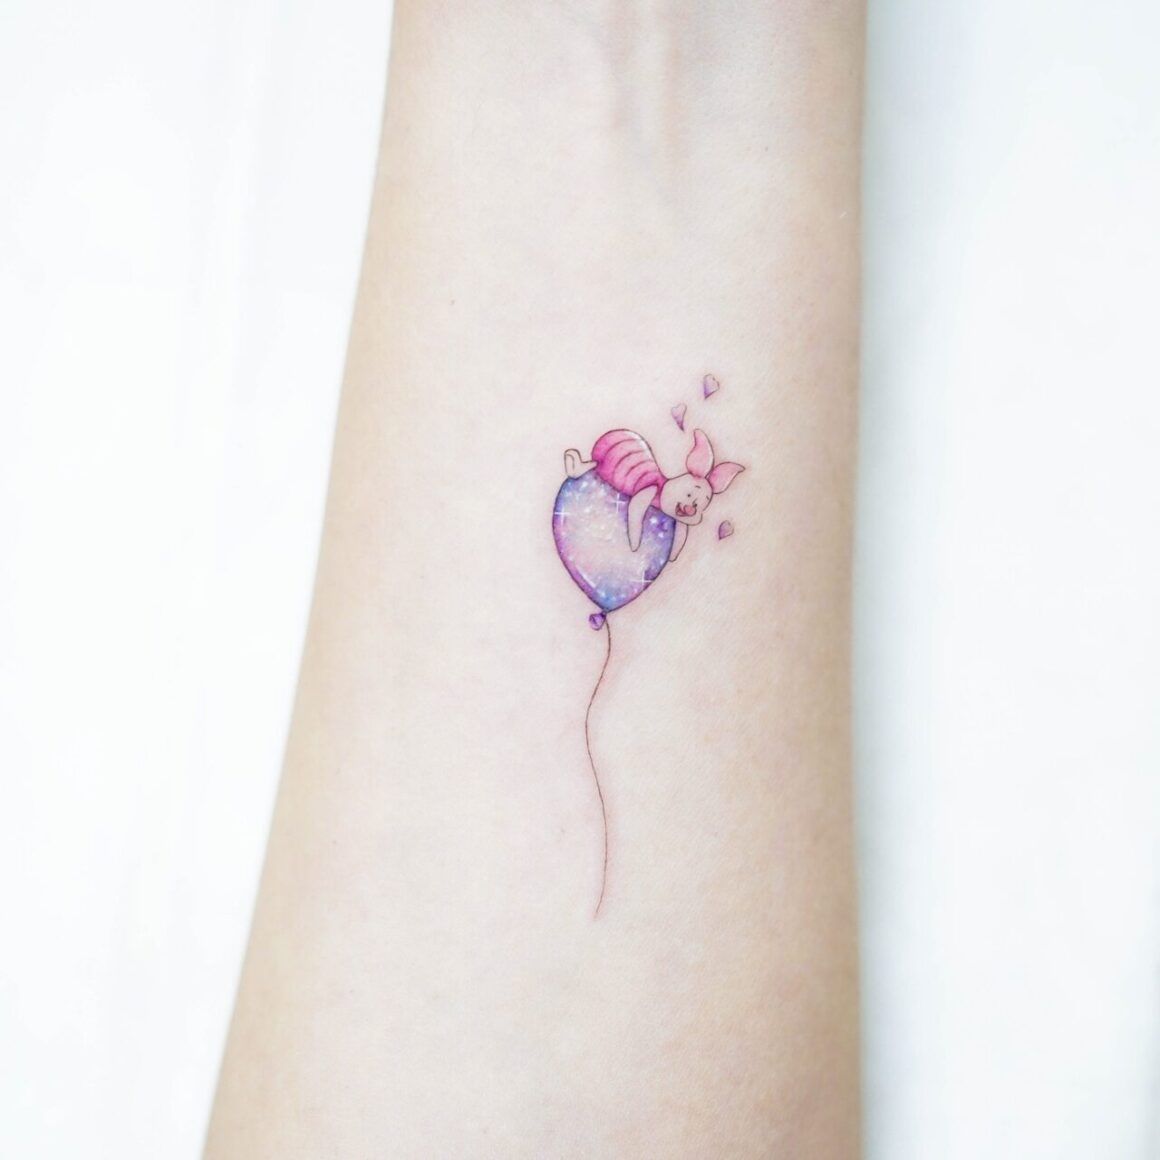 Mini Lau, Mini Tattoo, Hong Kong